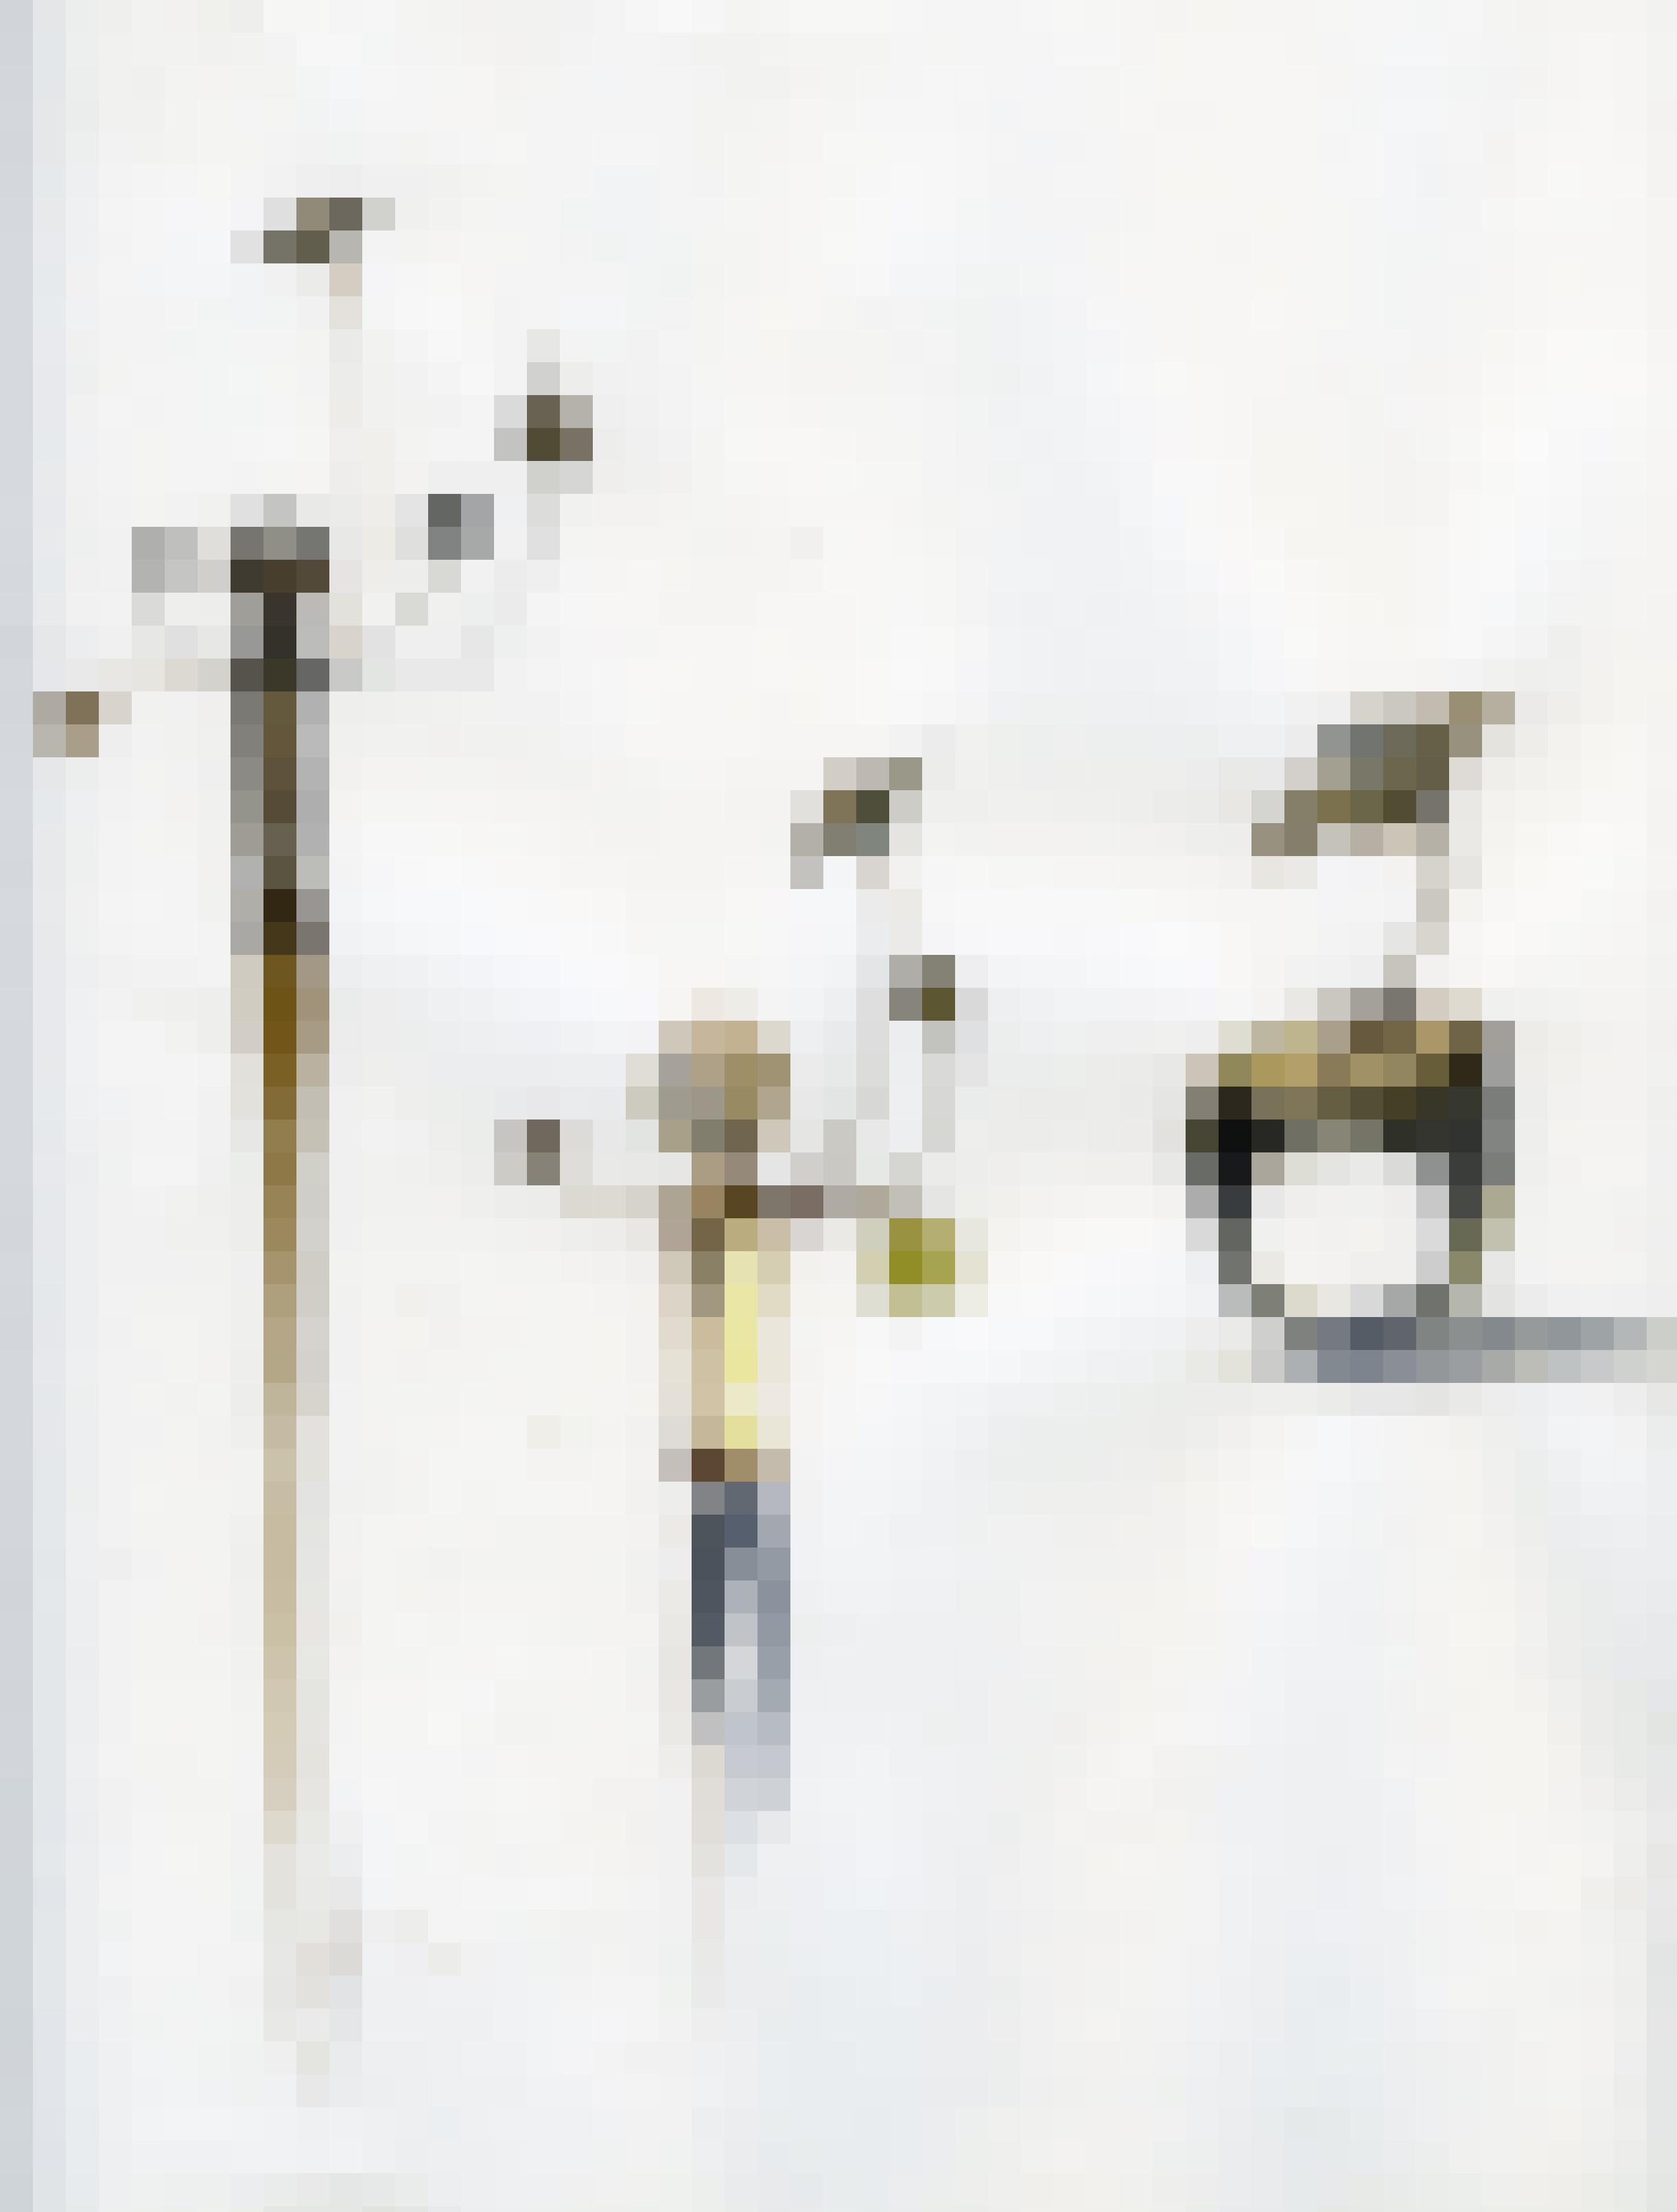 Sceptres-1527526160.jpg